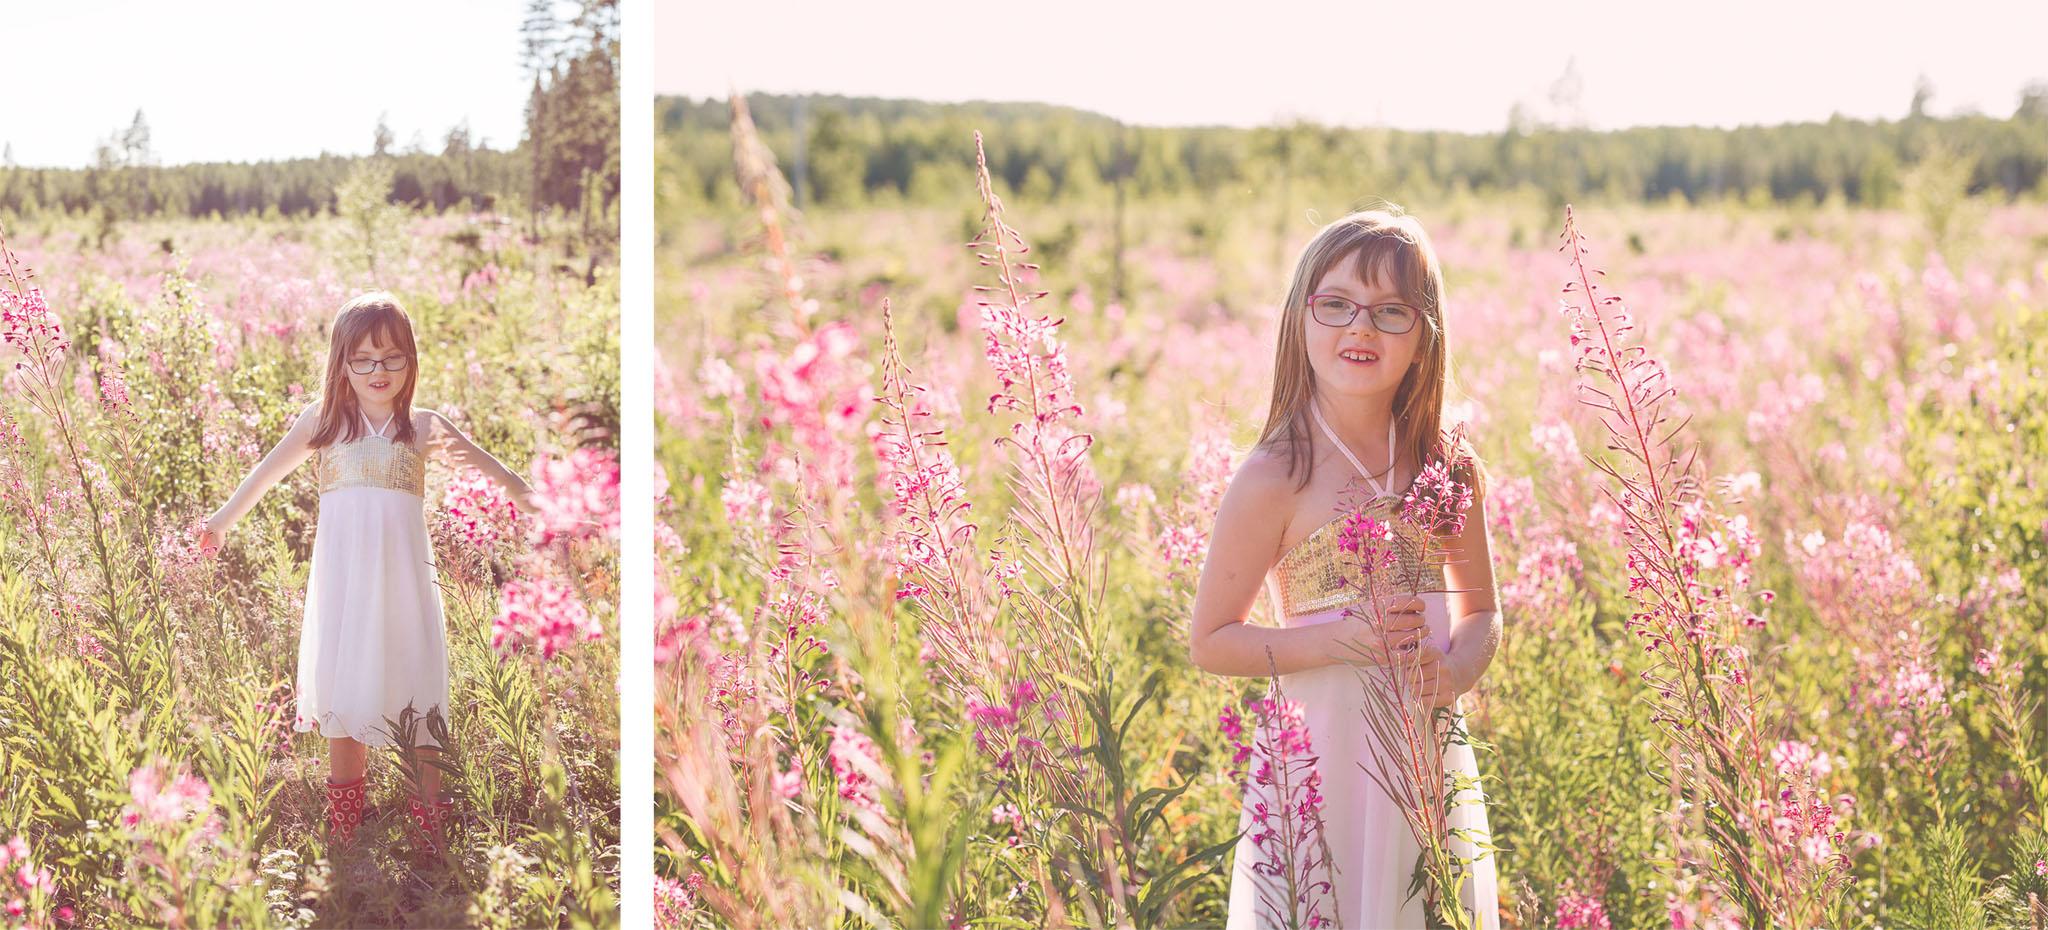 fotograf_sabina_wixner_hudiksvall_barn_familj_3.jpg